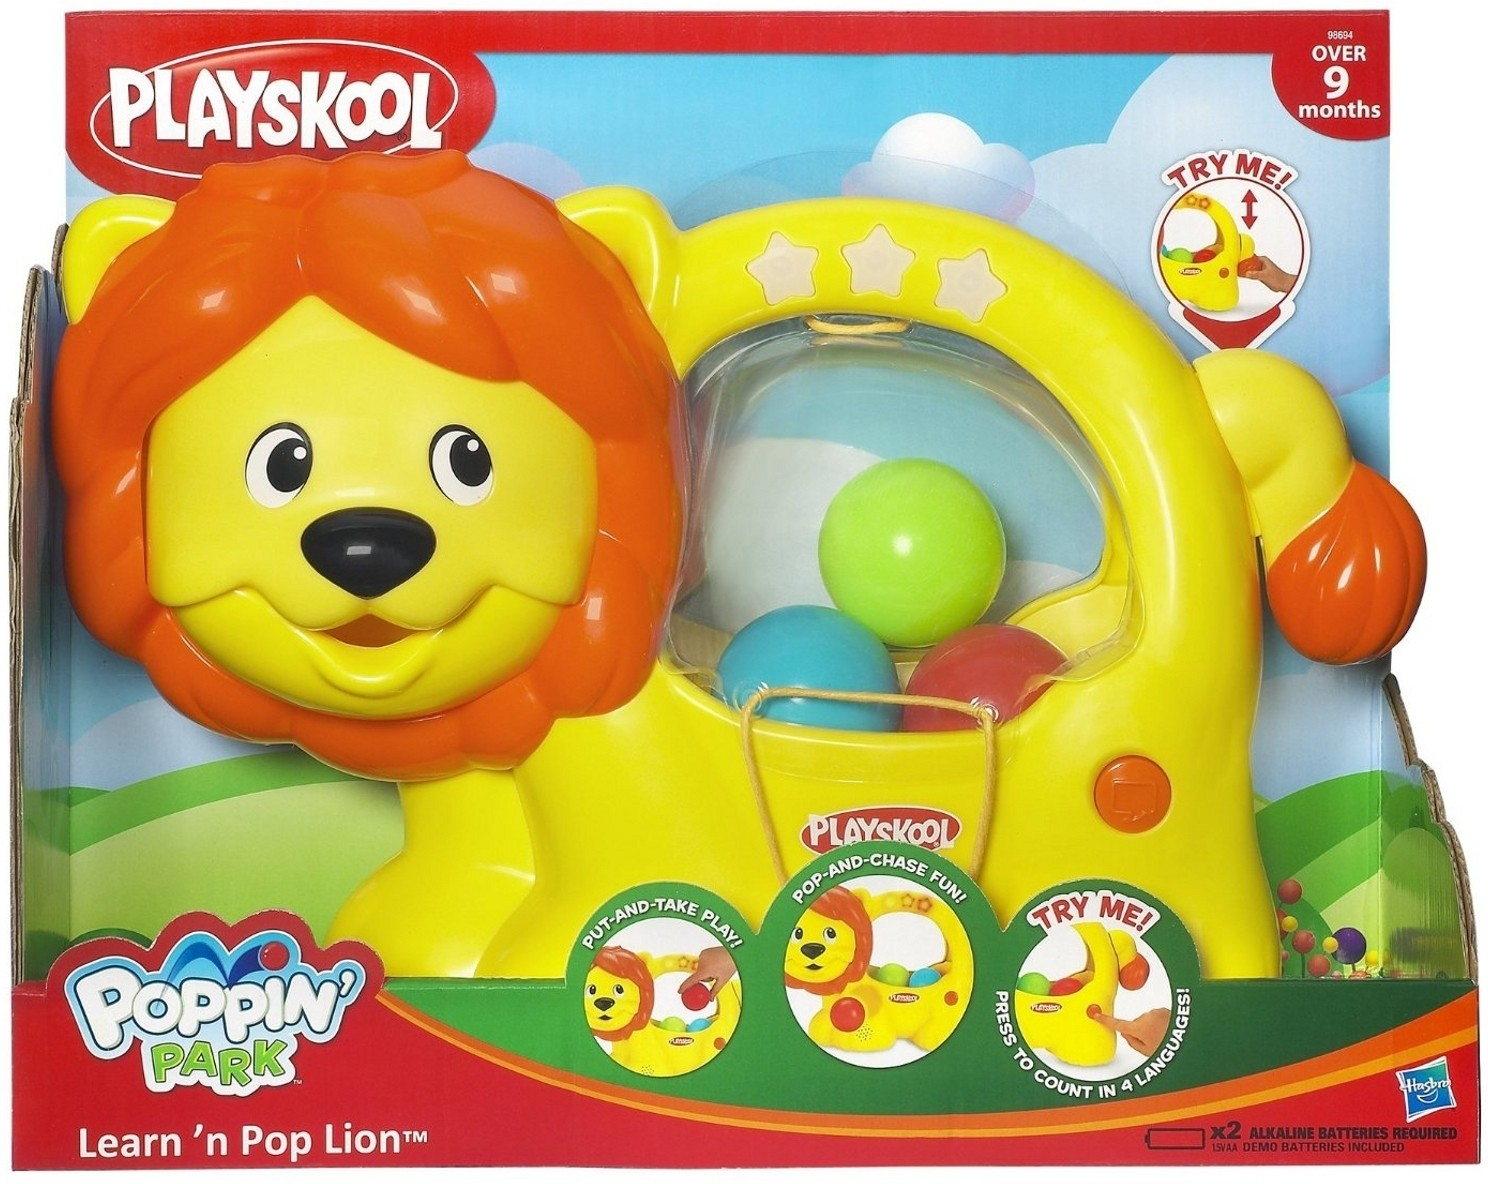 Playskool Busy Poppin Pals Playskool Price list i...